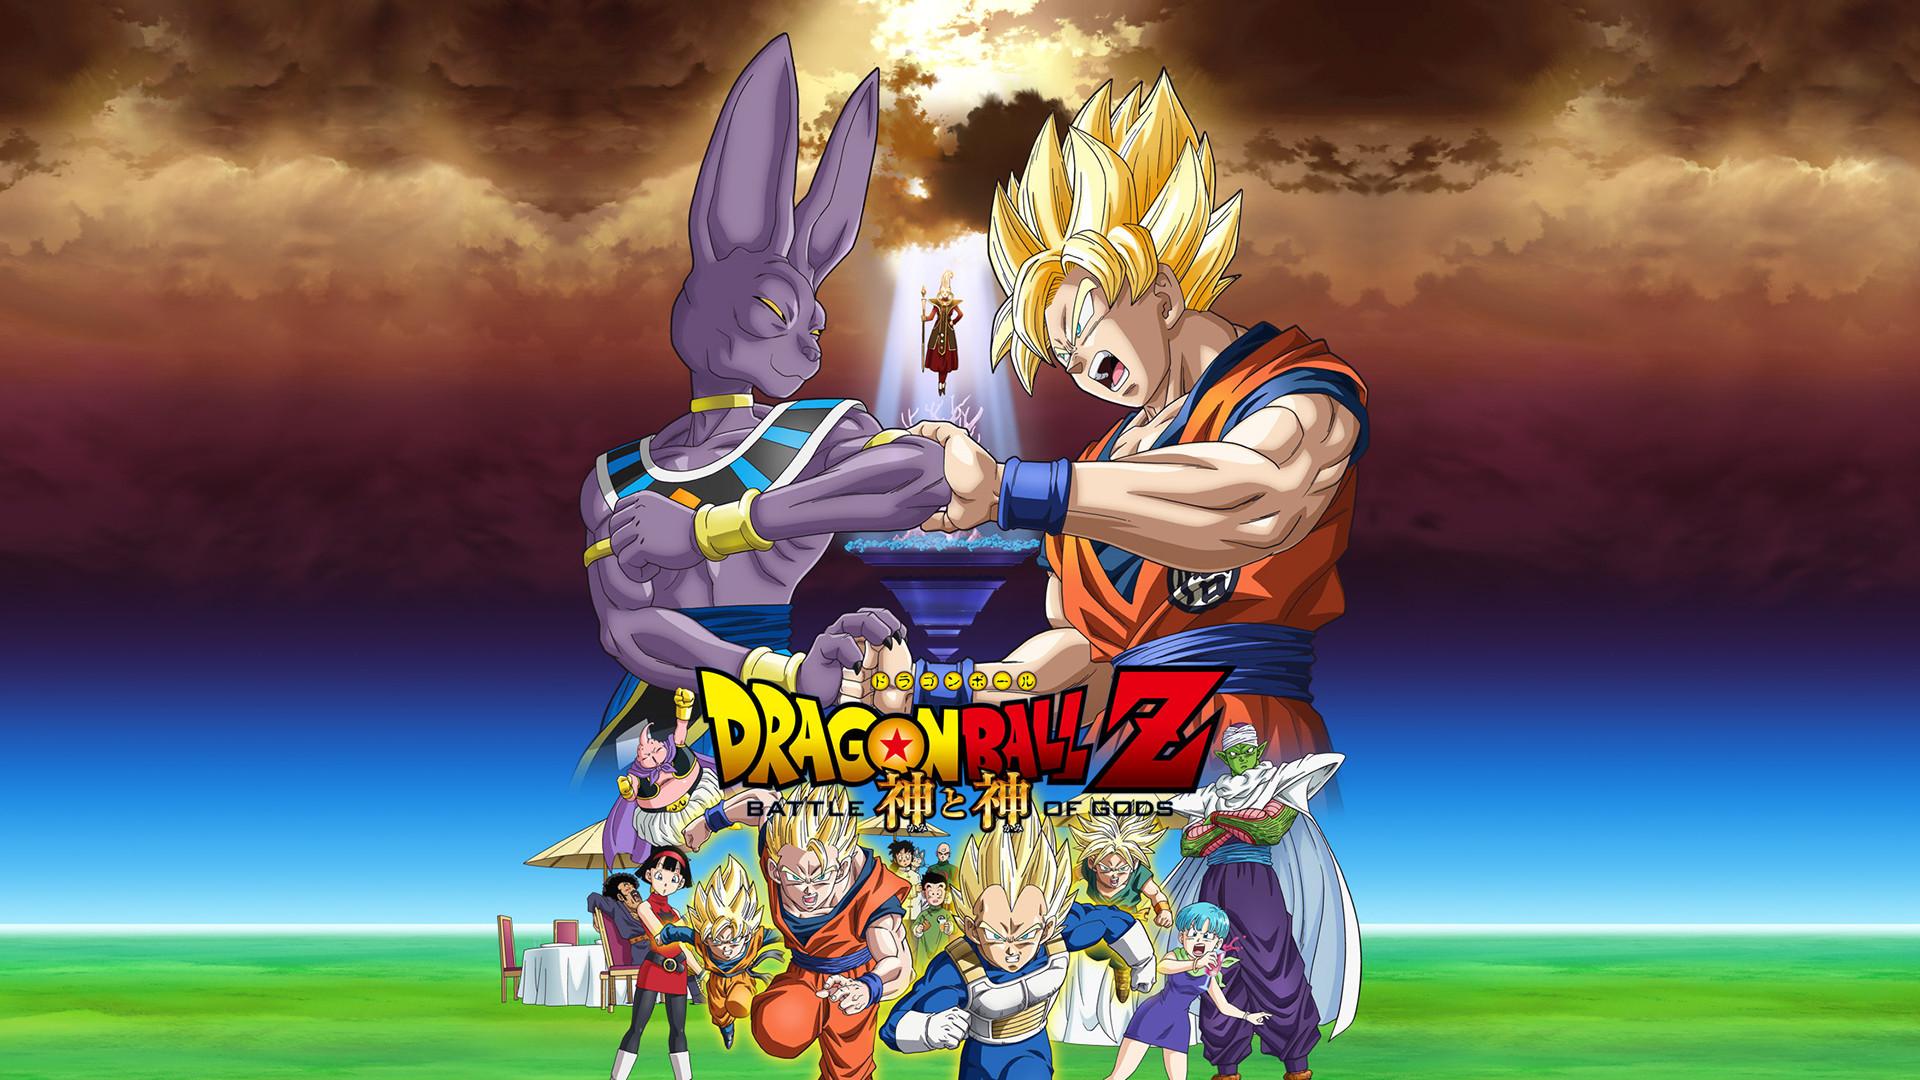 1080x1920 Dragon Ball Z Iphone Wallpaper